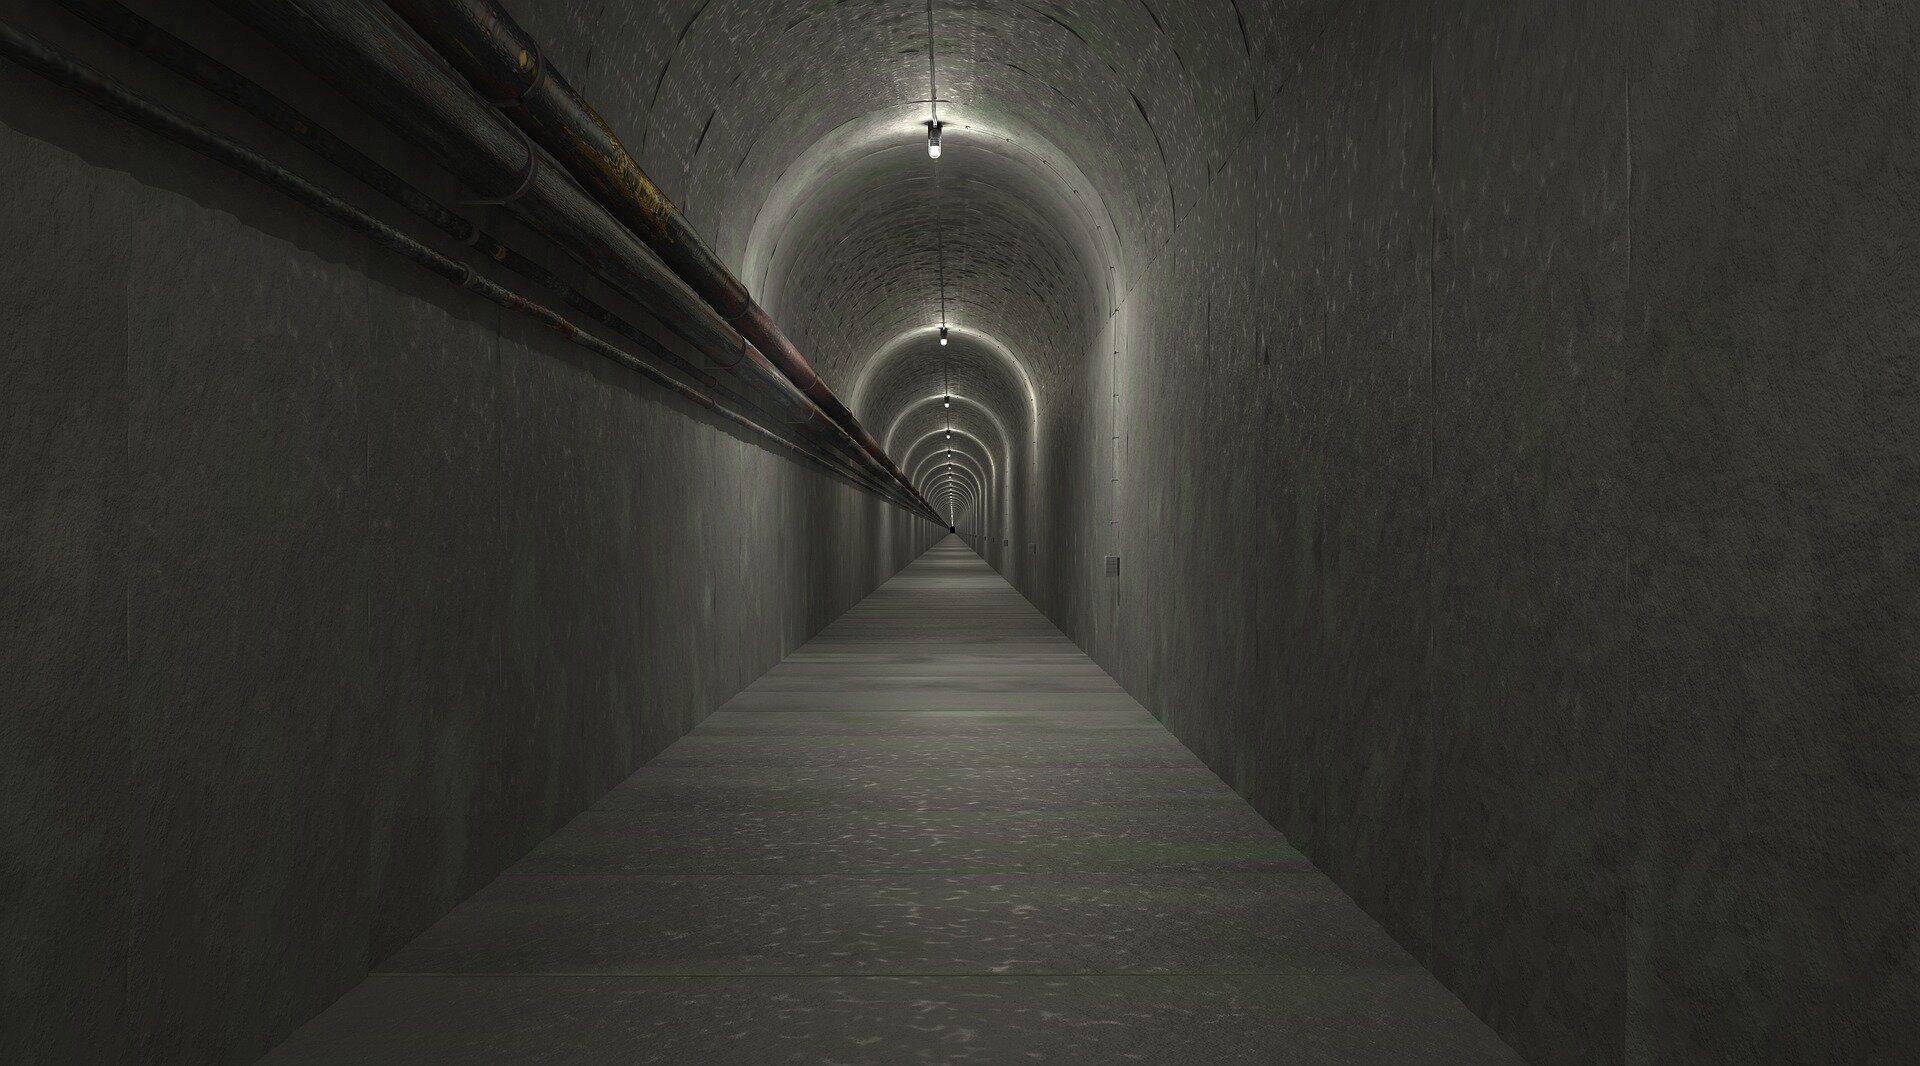 Salas Subterrâneas - Mapa de Londres